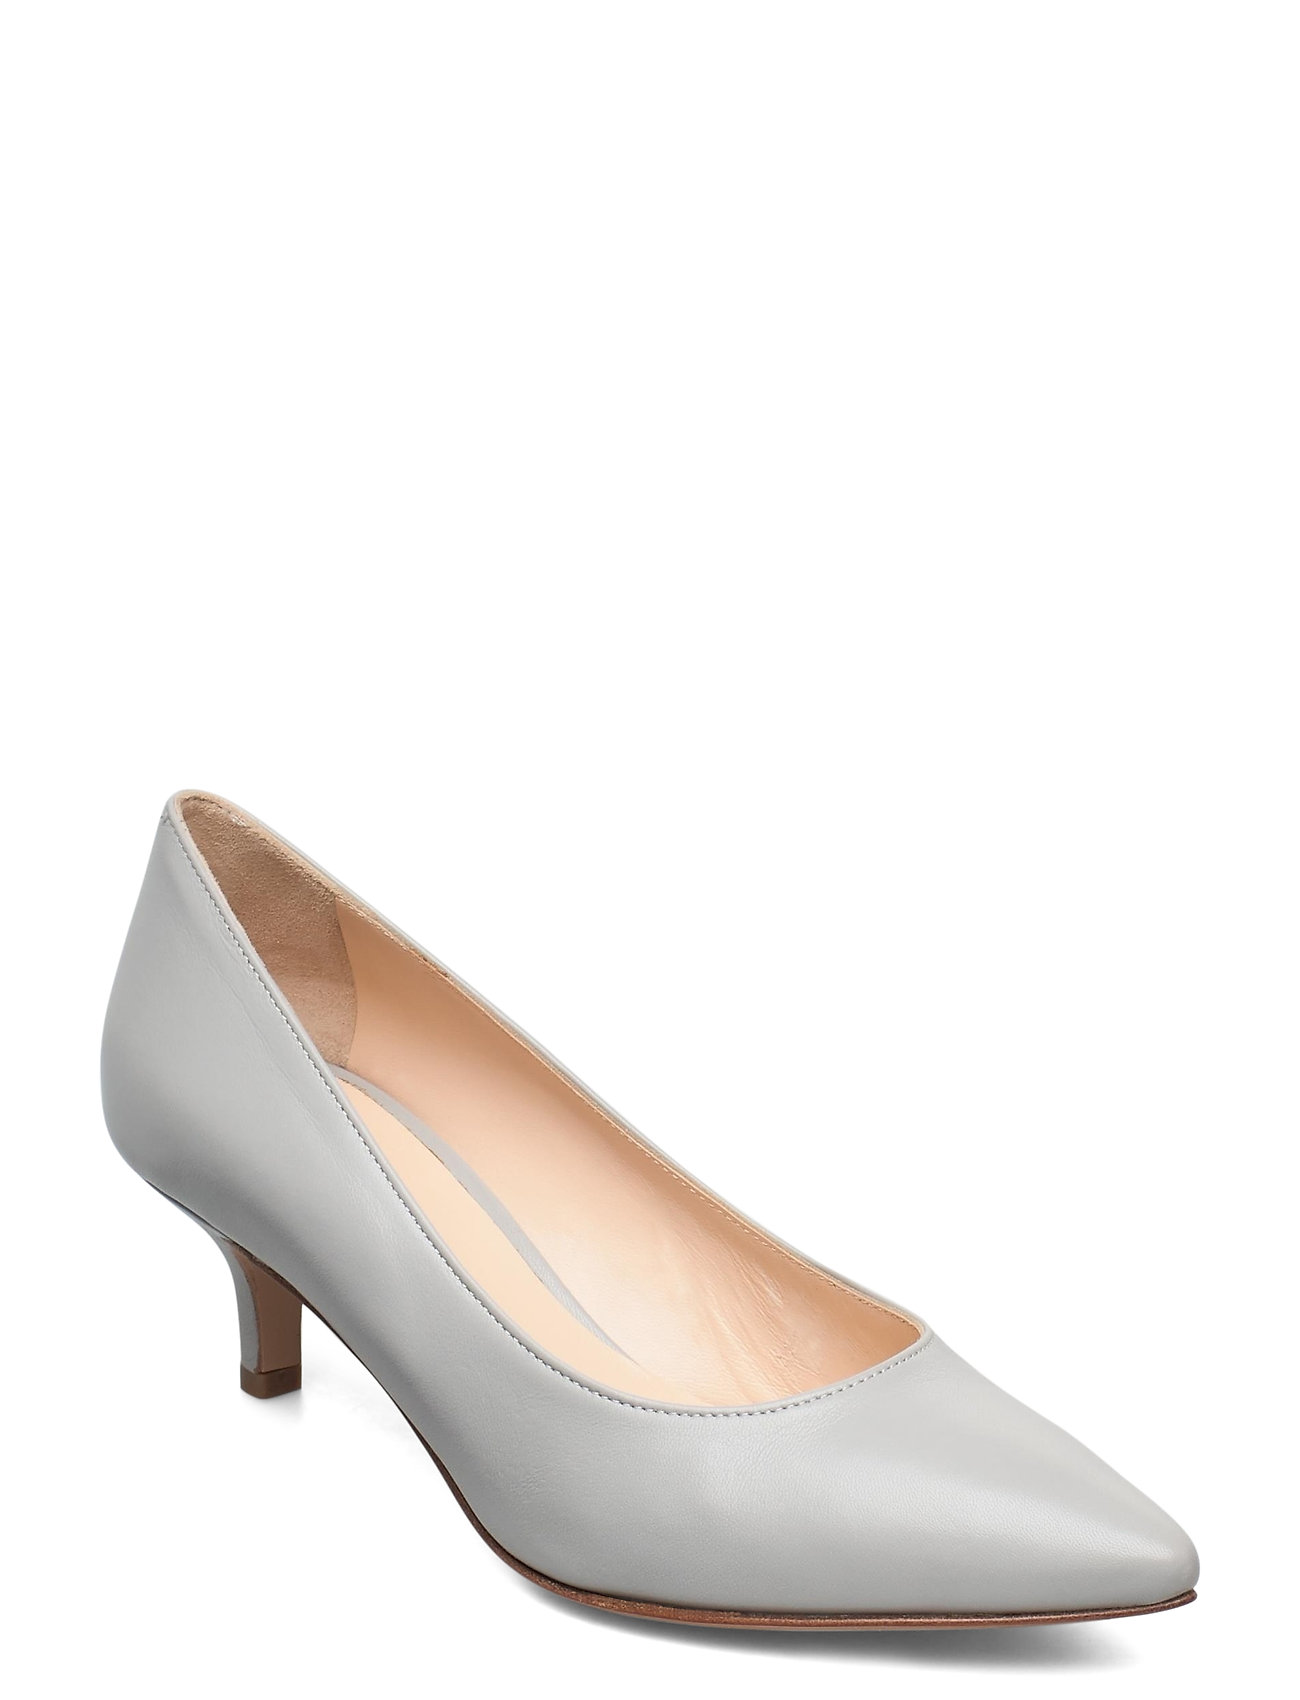 Image of Loui Shoes Heels Pumps Classic Grå Jennie-Ellen (3473872613)